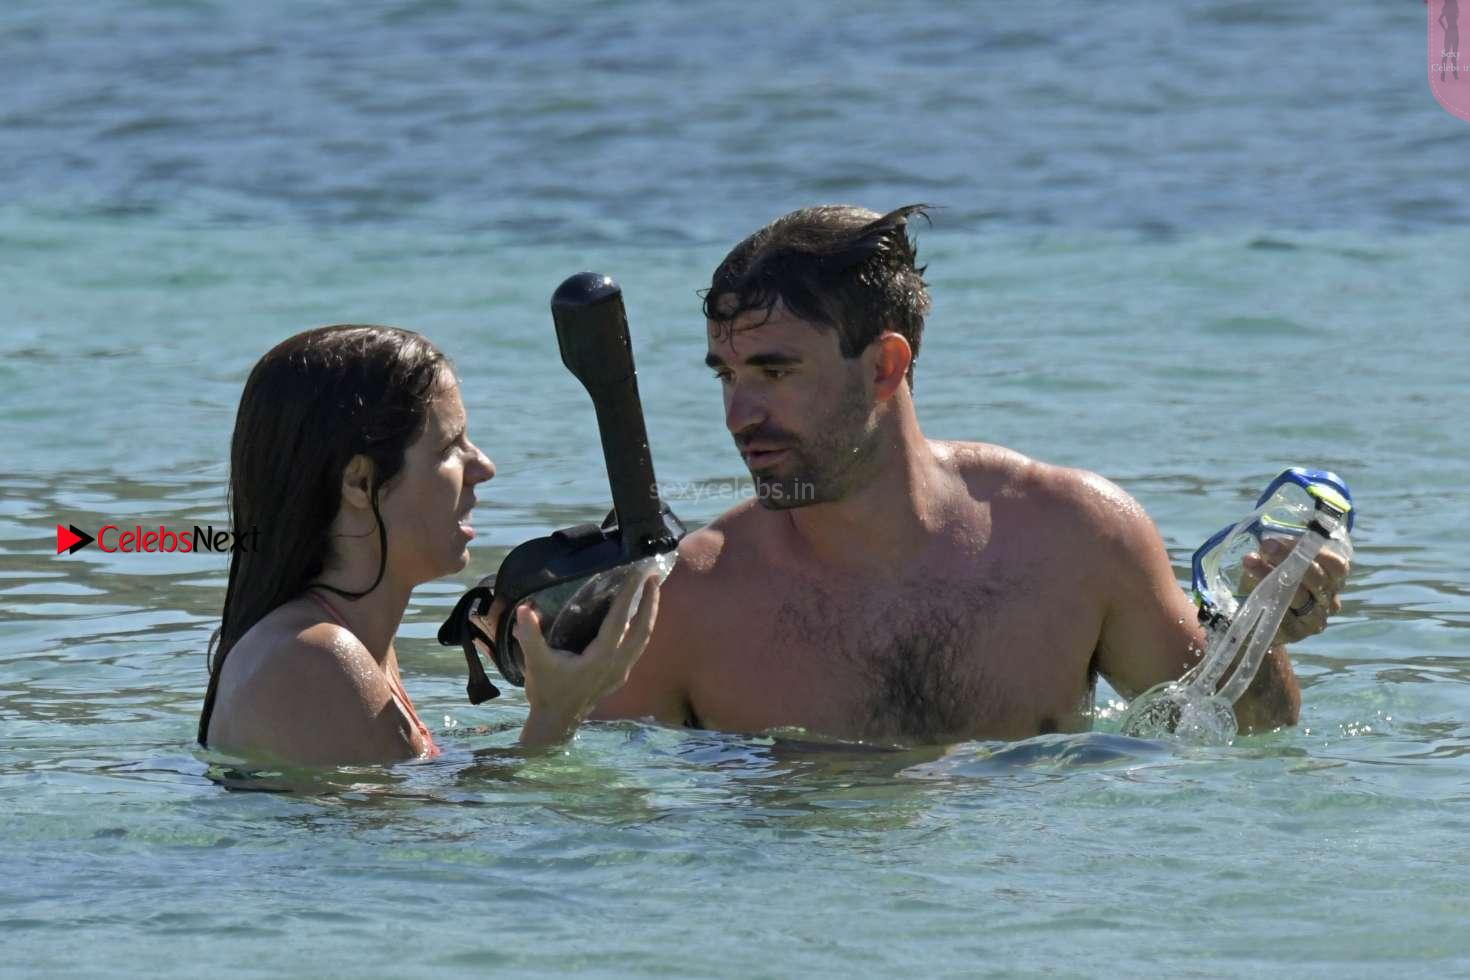 Katerina Stefanidi in orange wet Bikini withj Boyfriend Sex and fun boobs ass on the beach in Mykonos